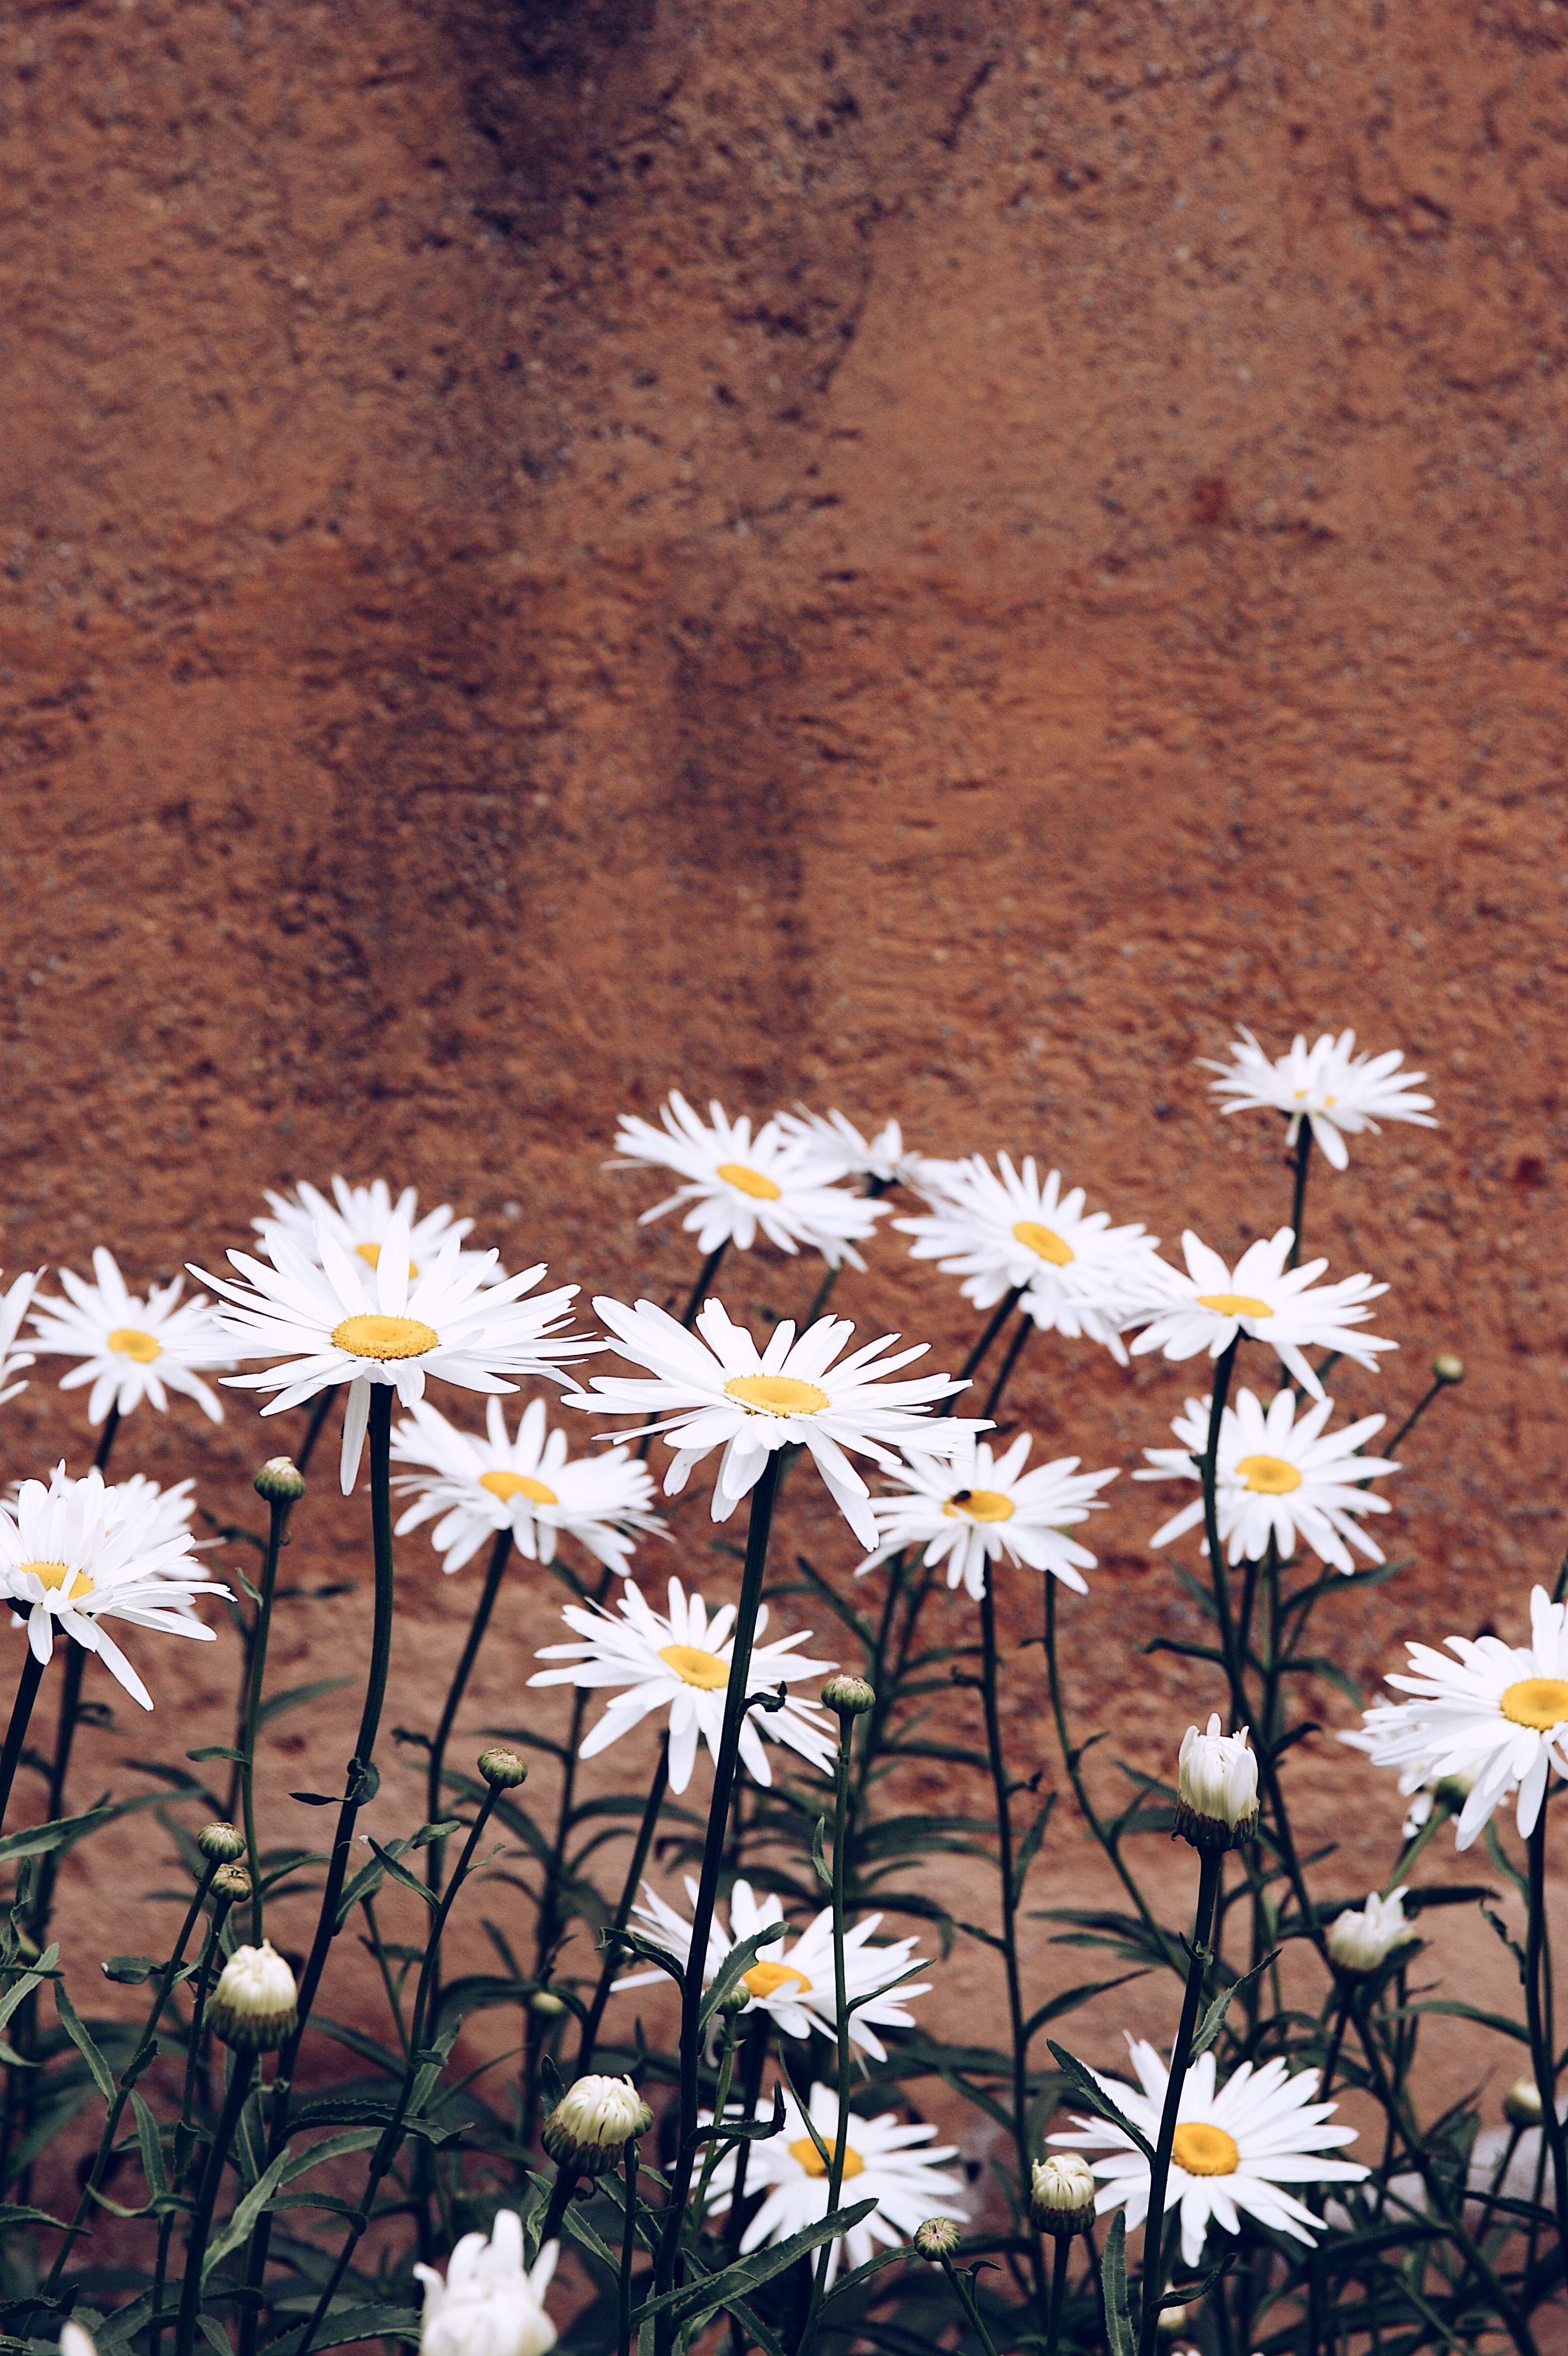 Wallpaper daisies